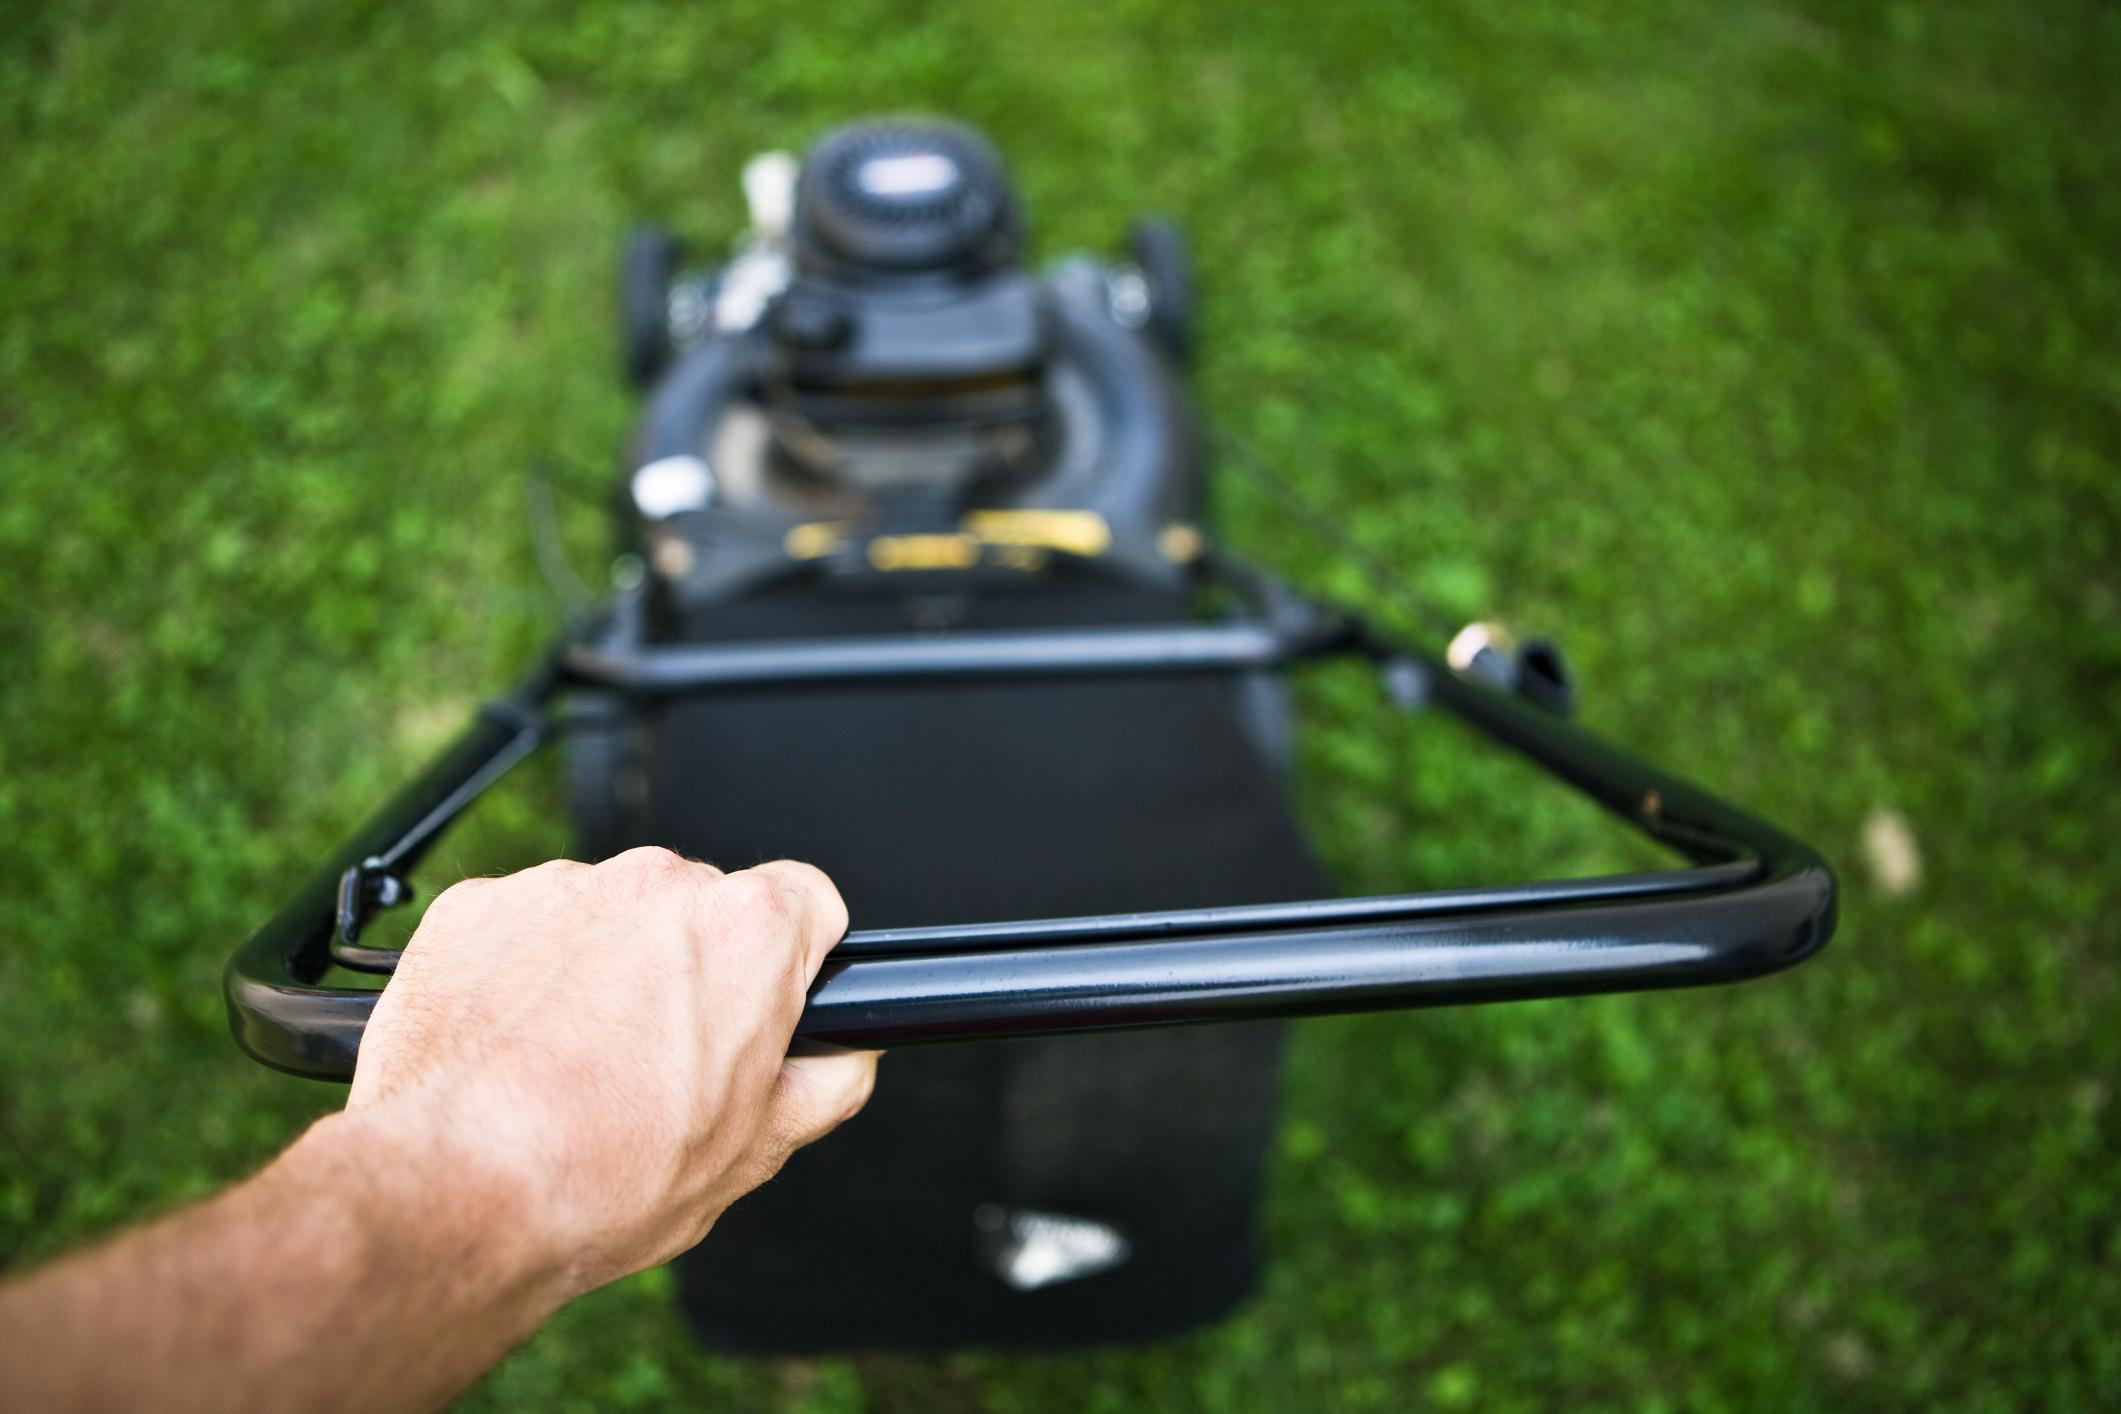 Hand of man pushing lawnmower